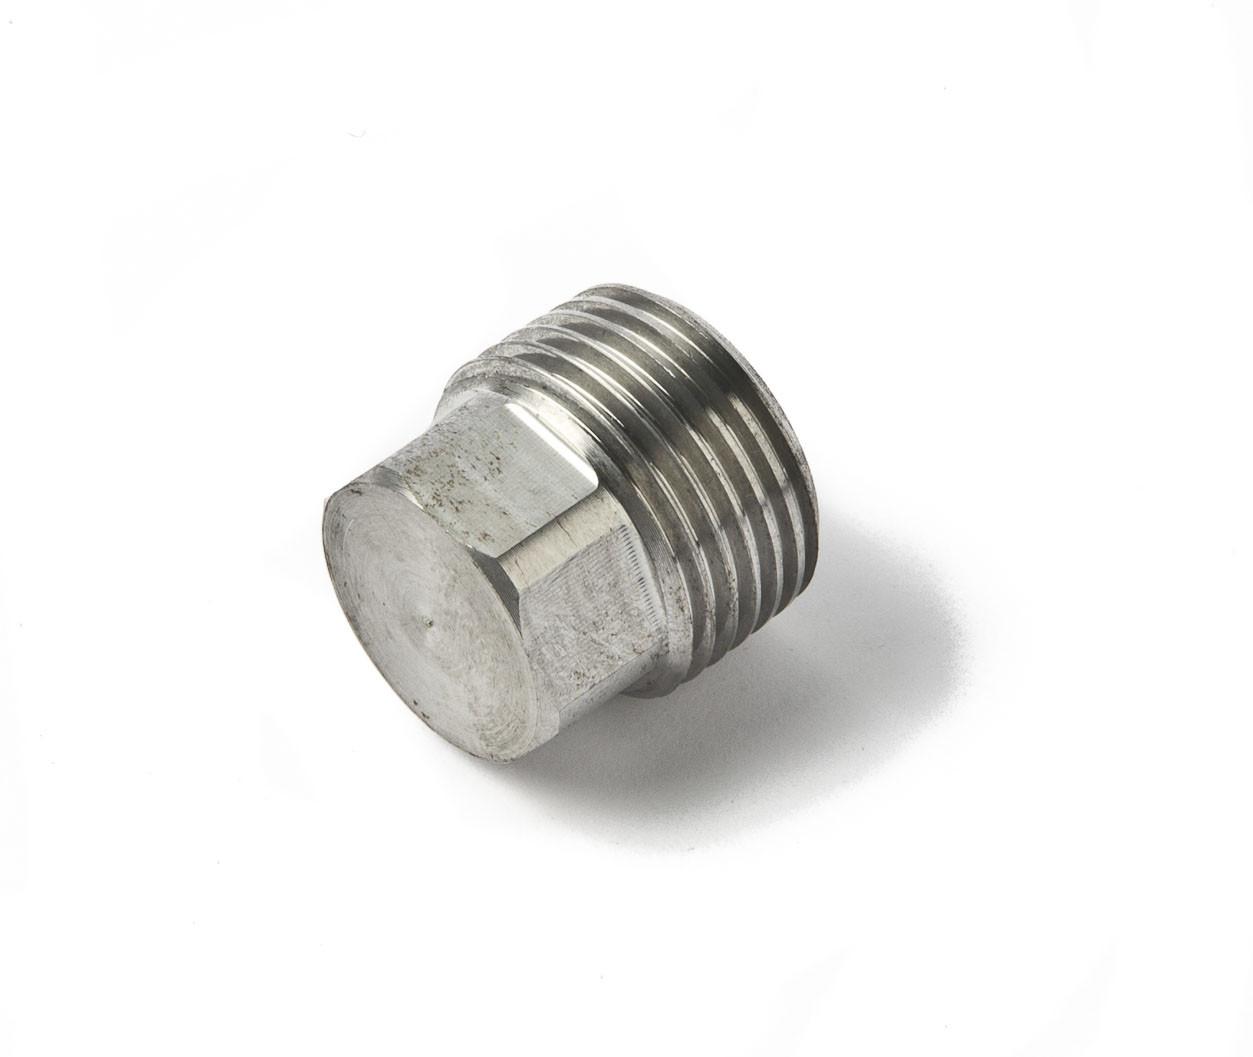 Blanking plug